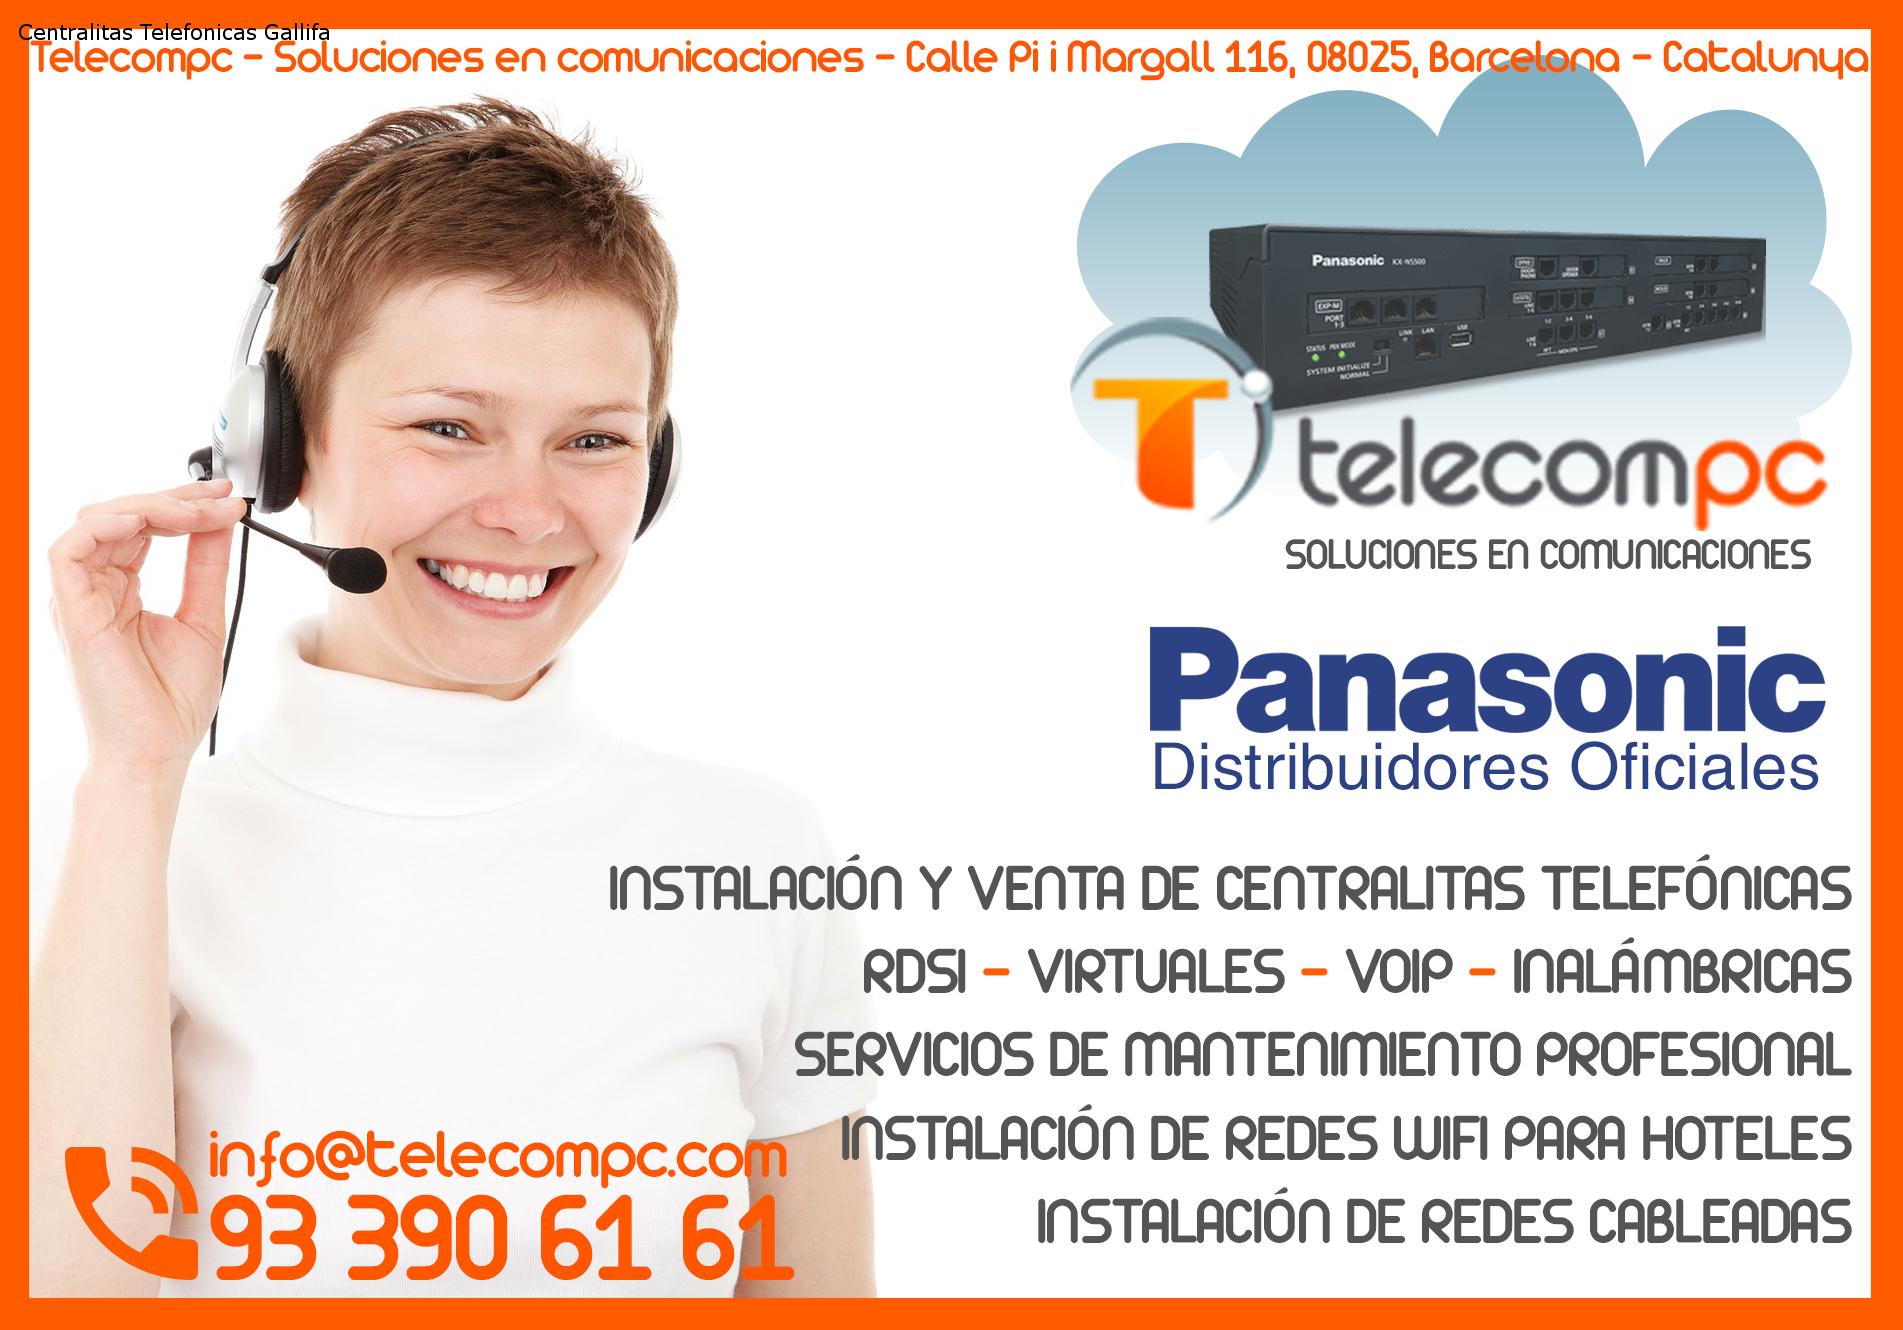 Centralitas Telefonicas Gallifa